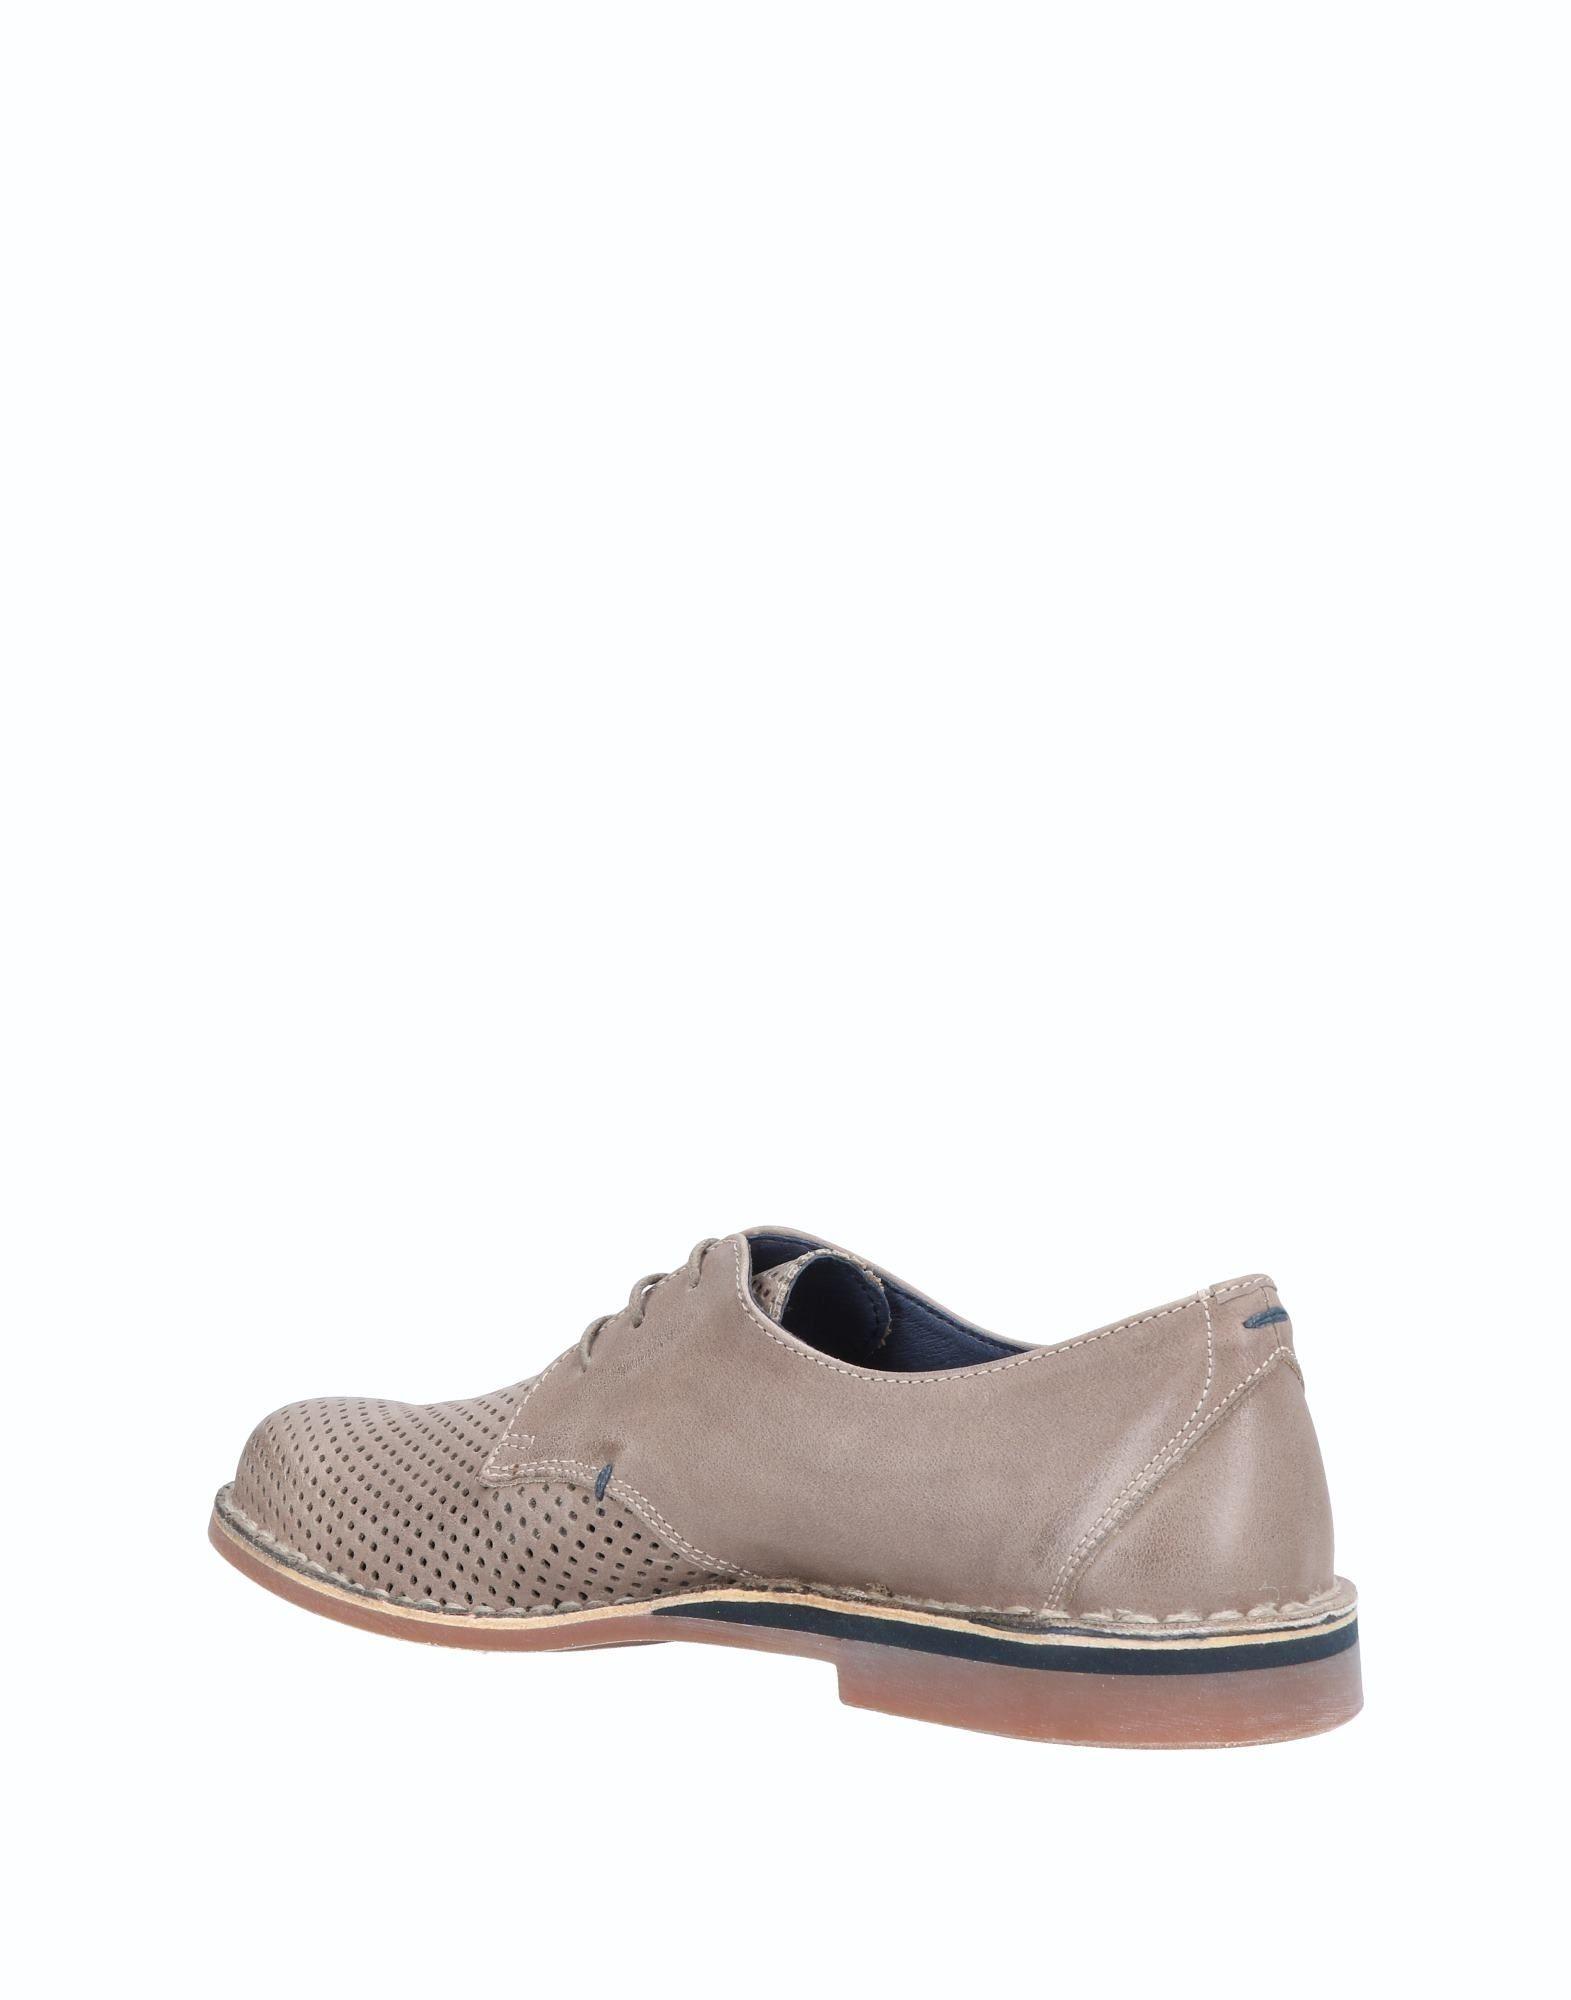 Rabatt echte Schnürschuhe Schuhe Kebo Schnürschuhe echte Herren  11463894VP 32f845